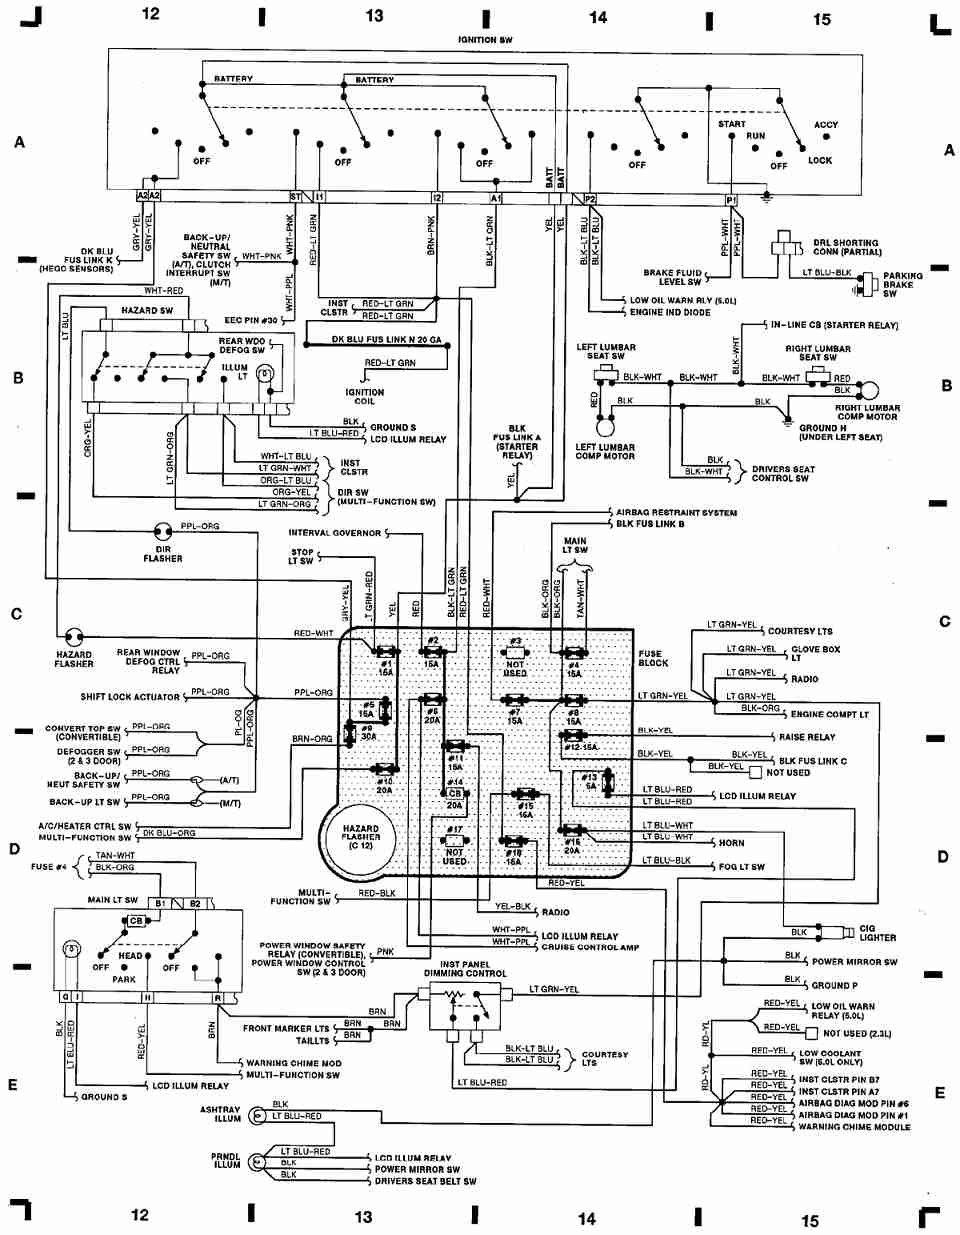 93 mustang wiring diagram | exposure-connection wiring diagram number -  exposure-connection.garbobar.it  garbo bar